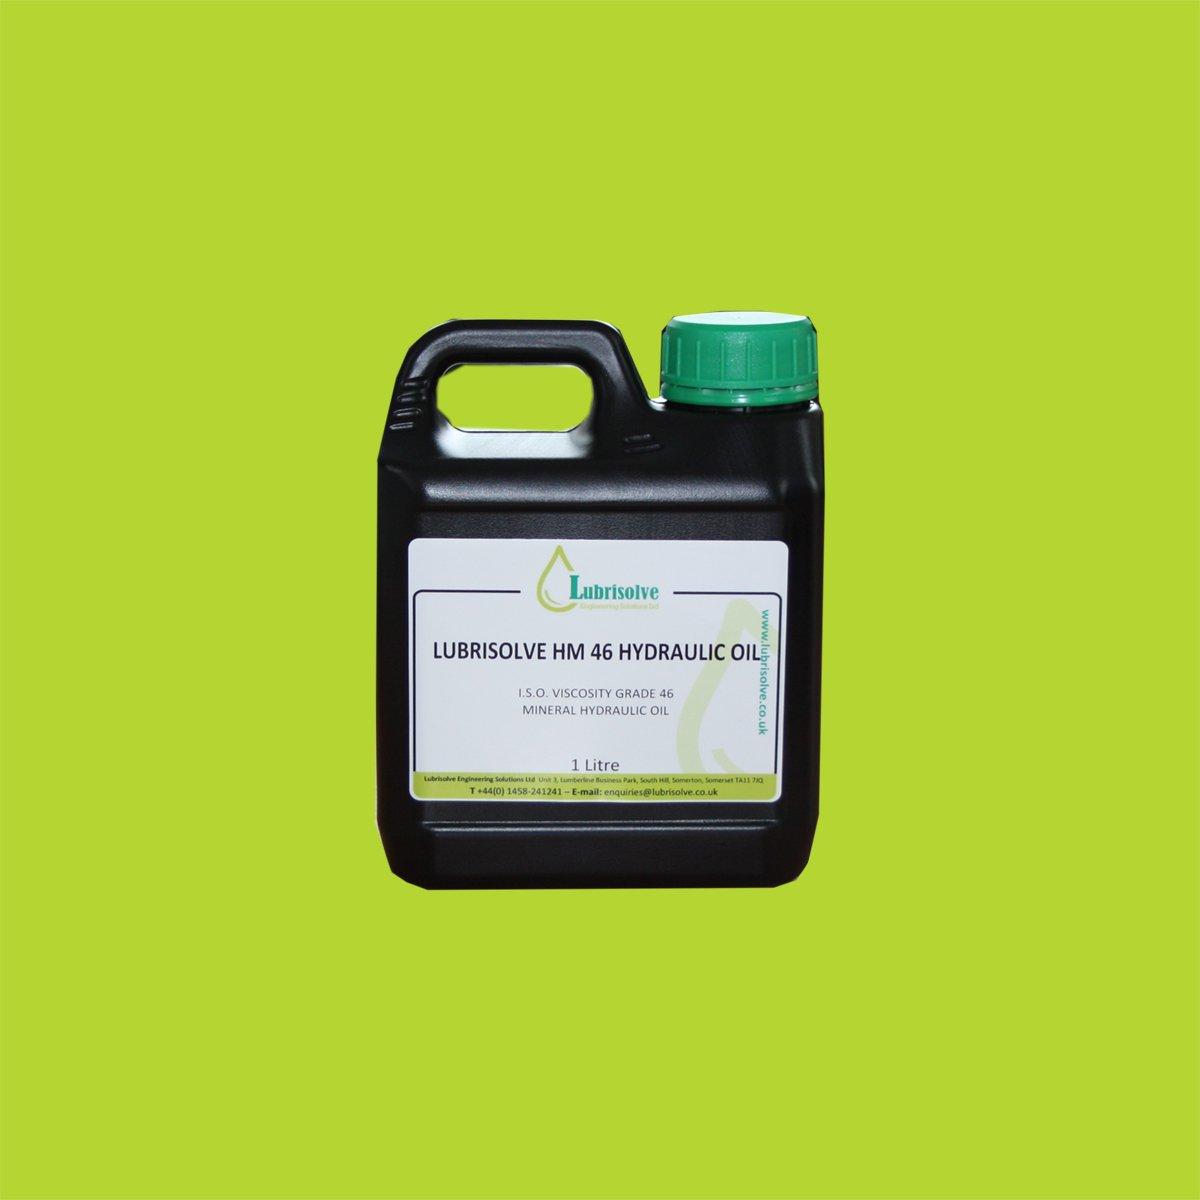 Lubrisolve HM 46 Hydraulic Oil (1 litre)